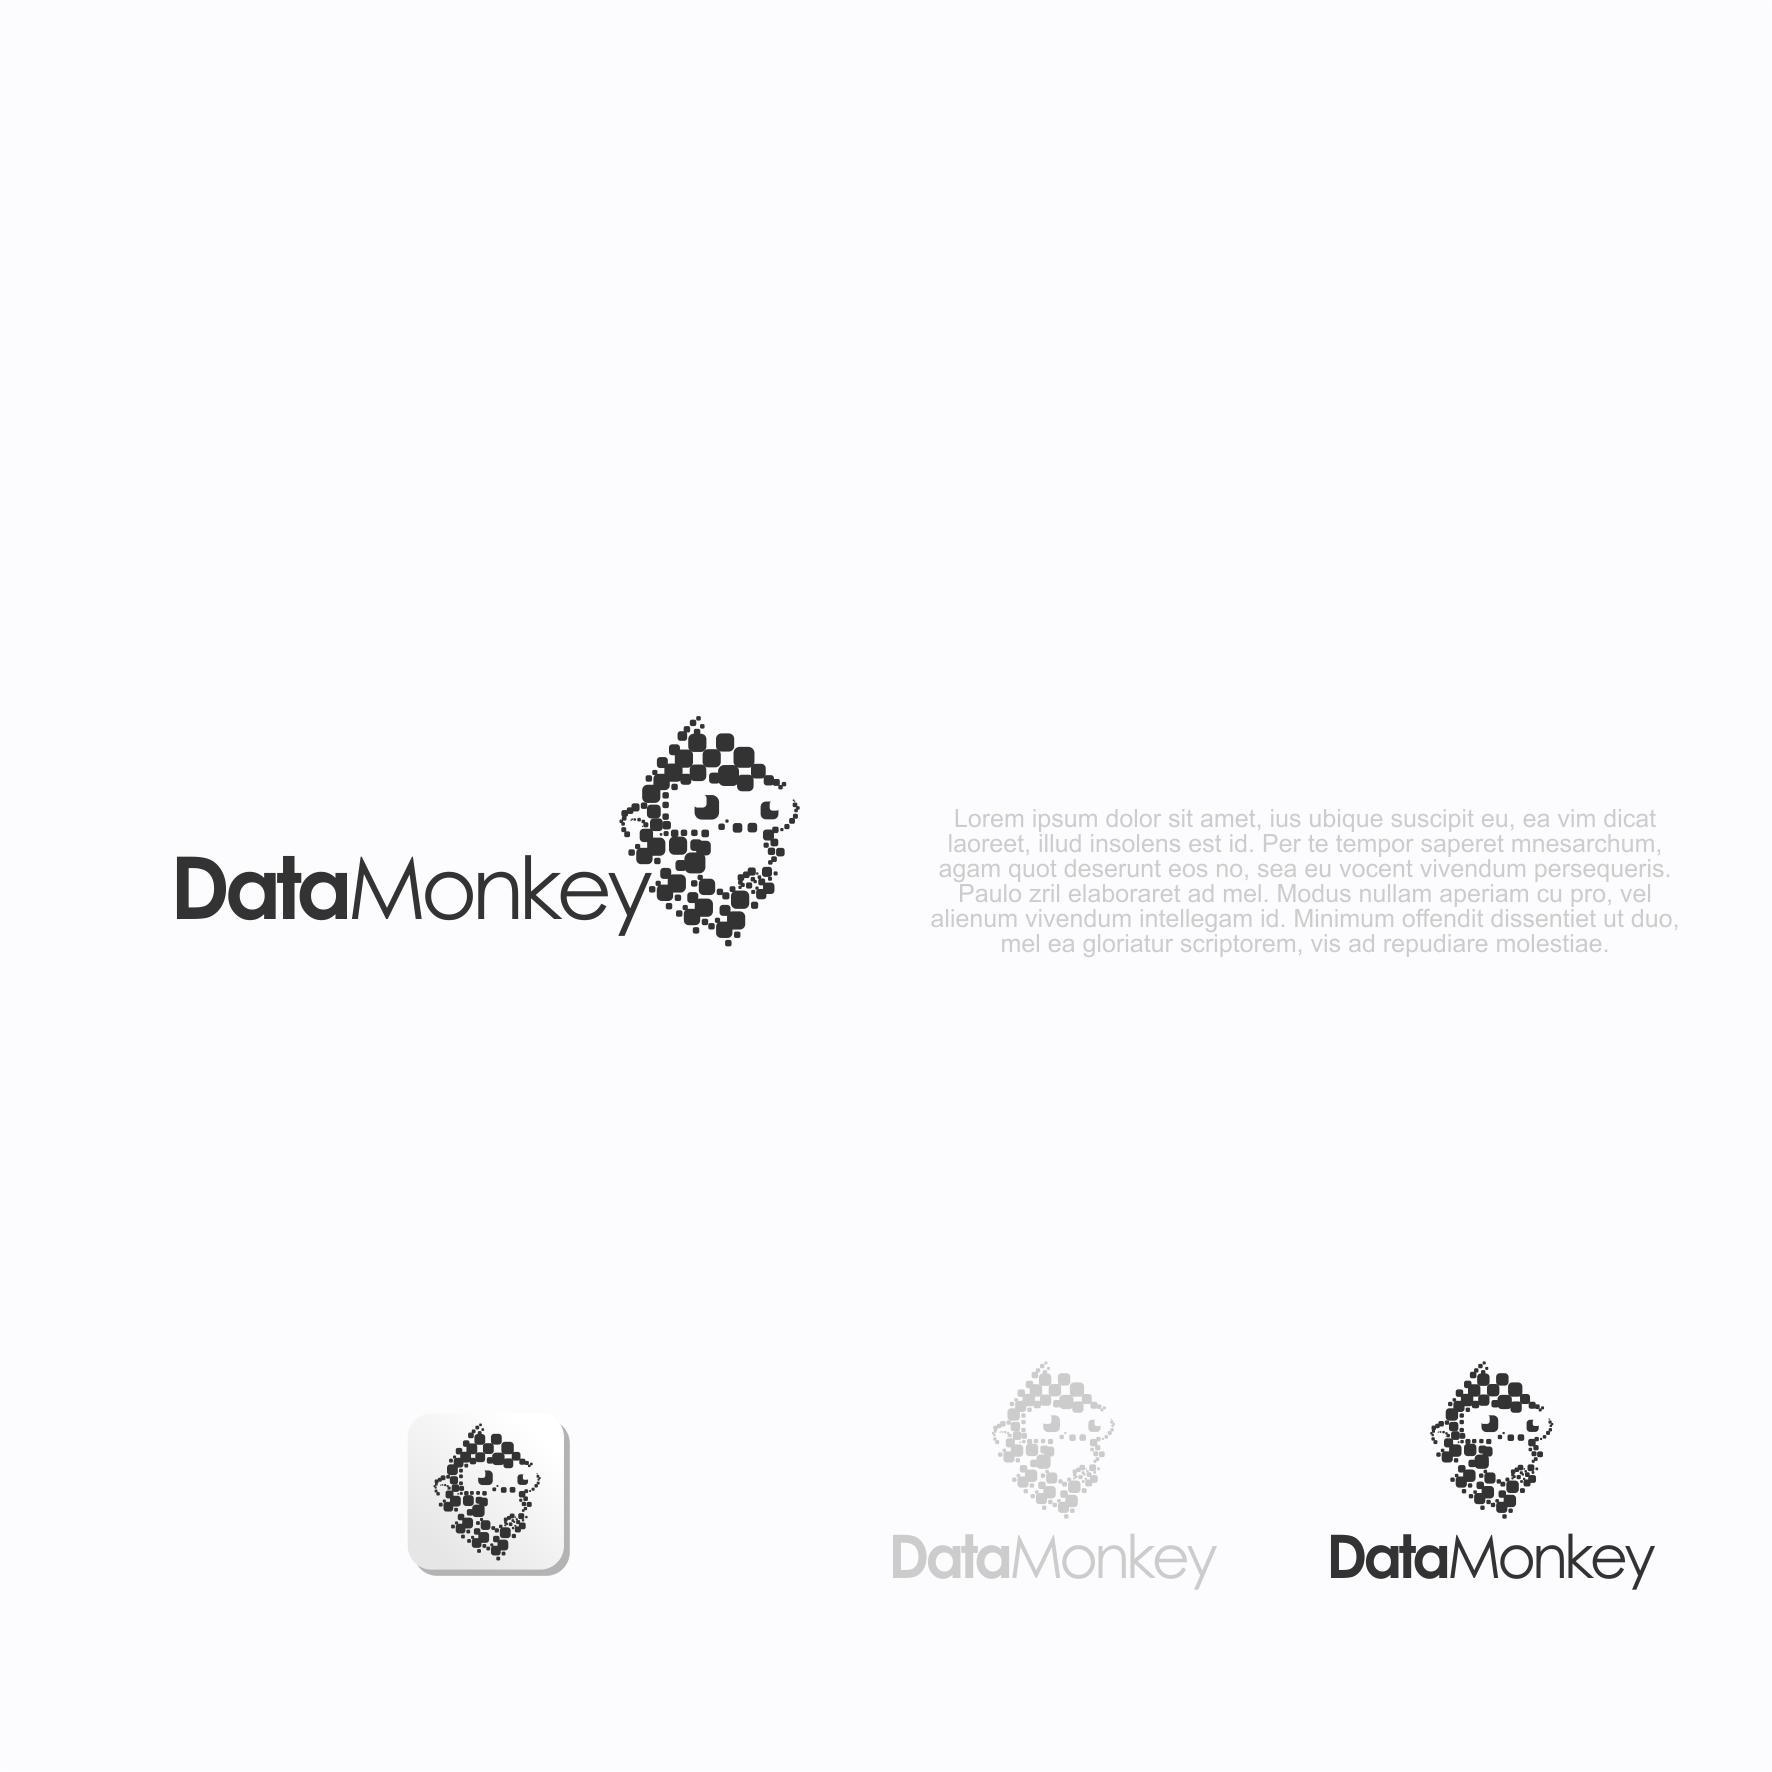 DataMonkey logo